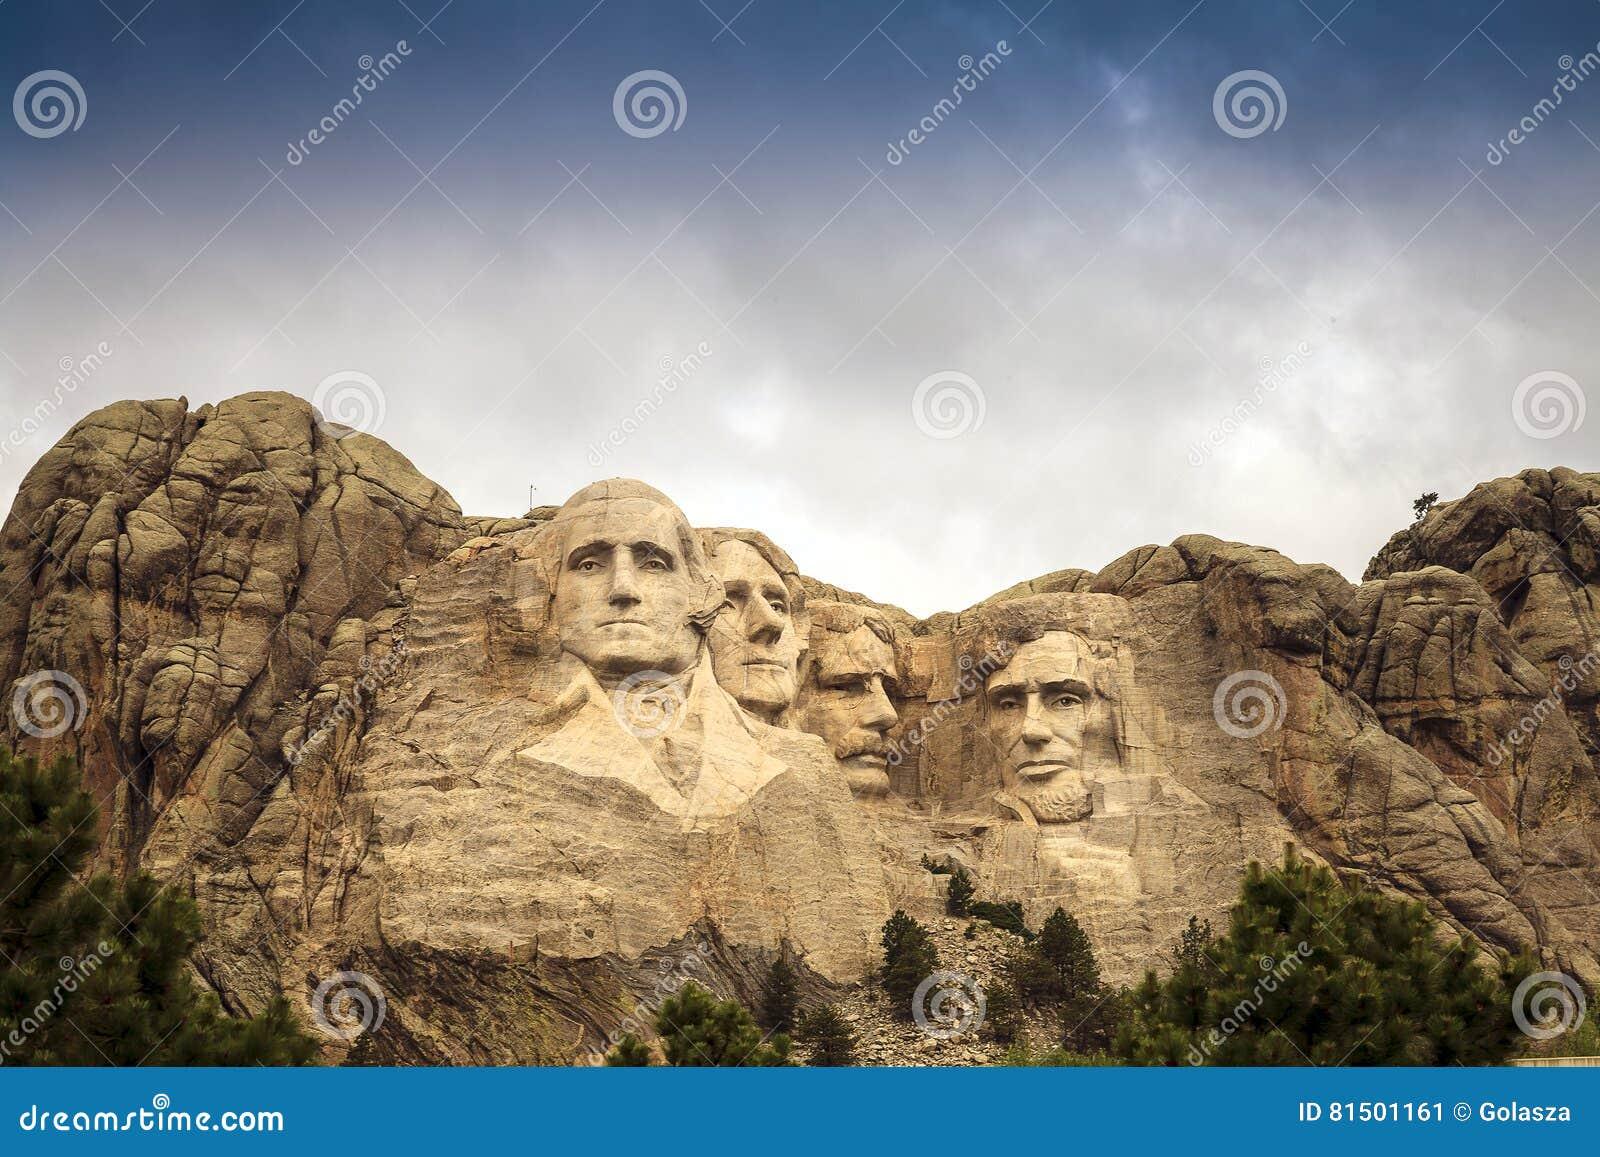 Mount Rushmore medborgare Memorial Park i South Dakota, USA Scul